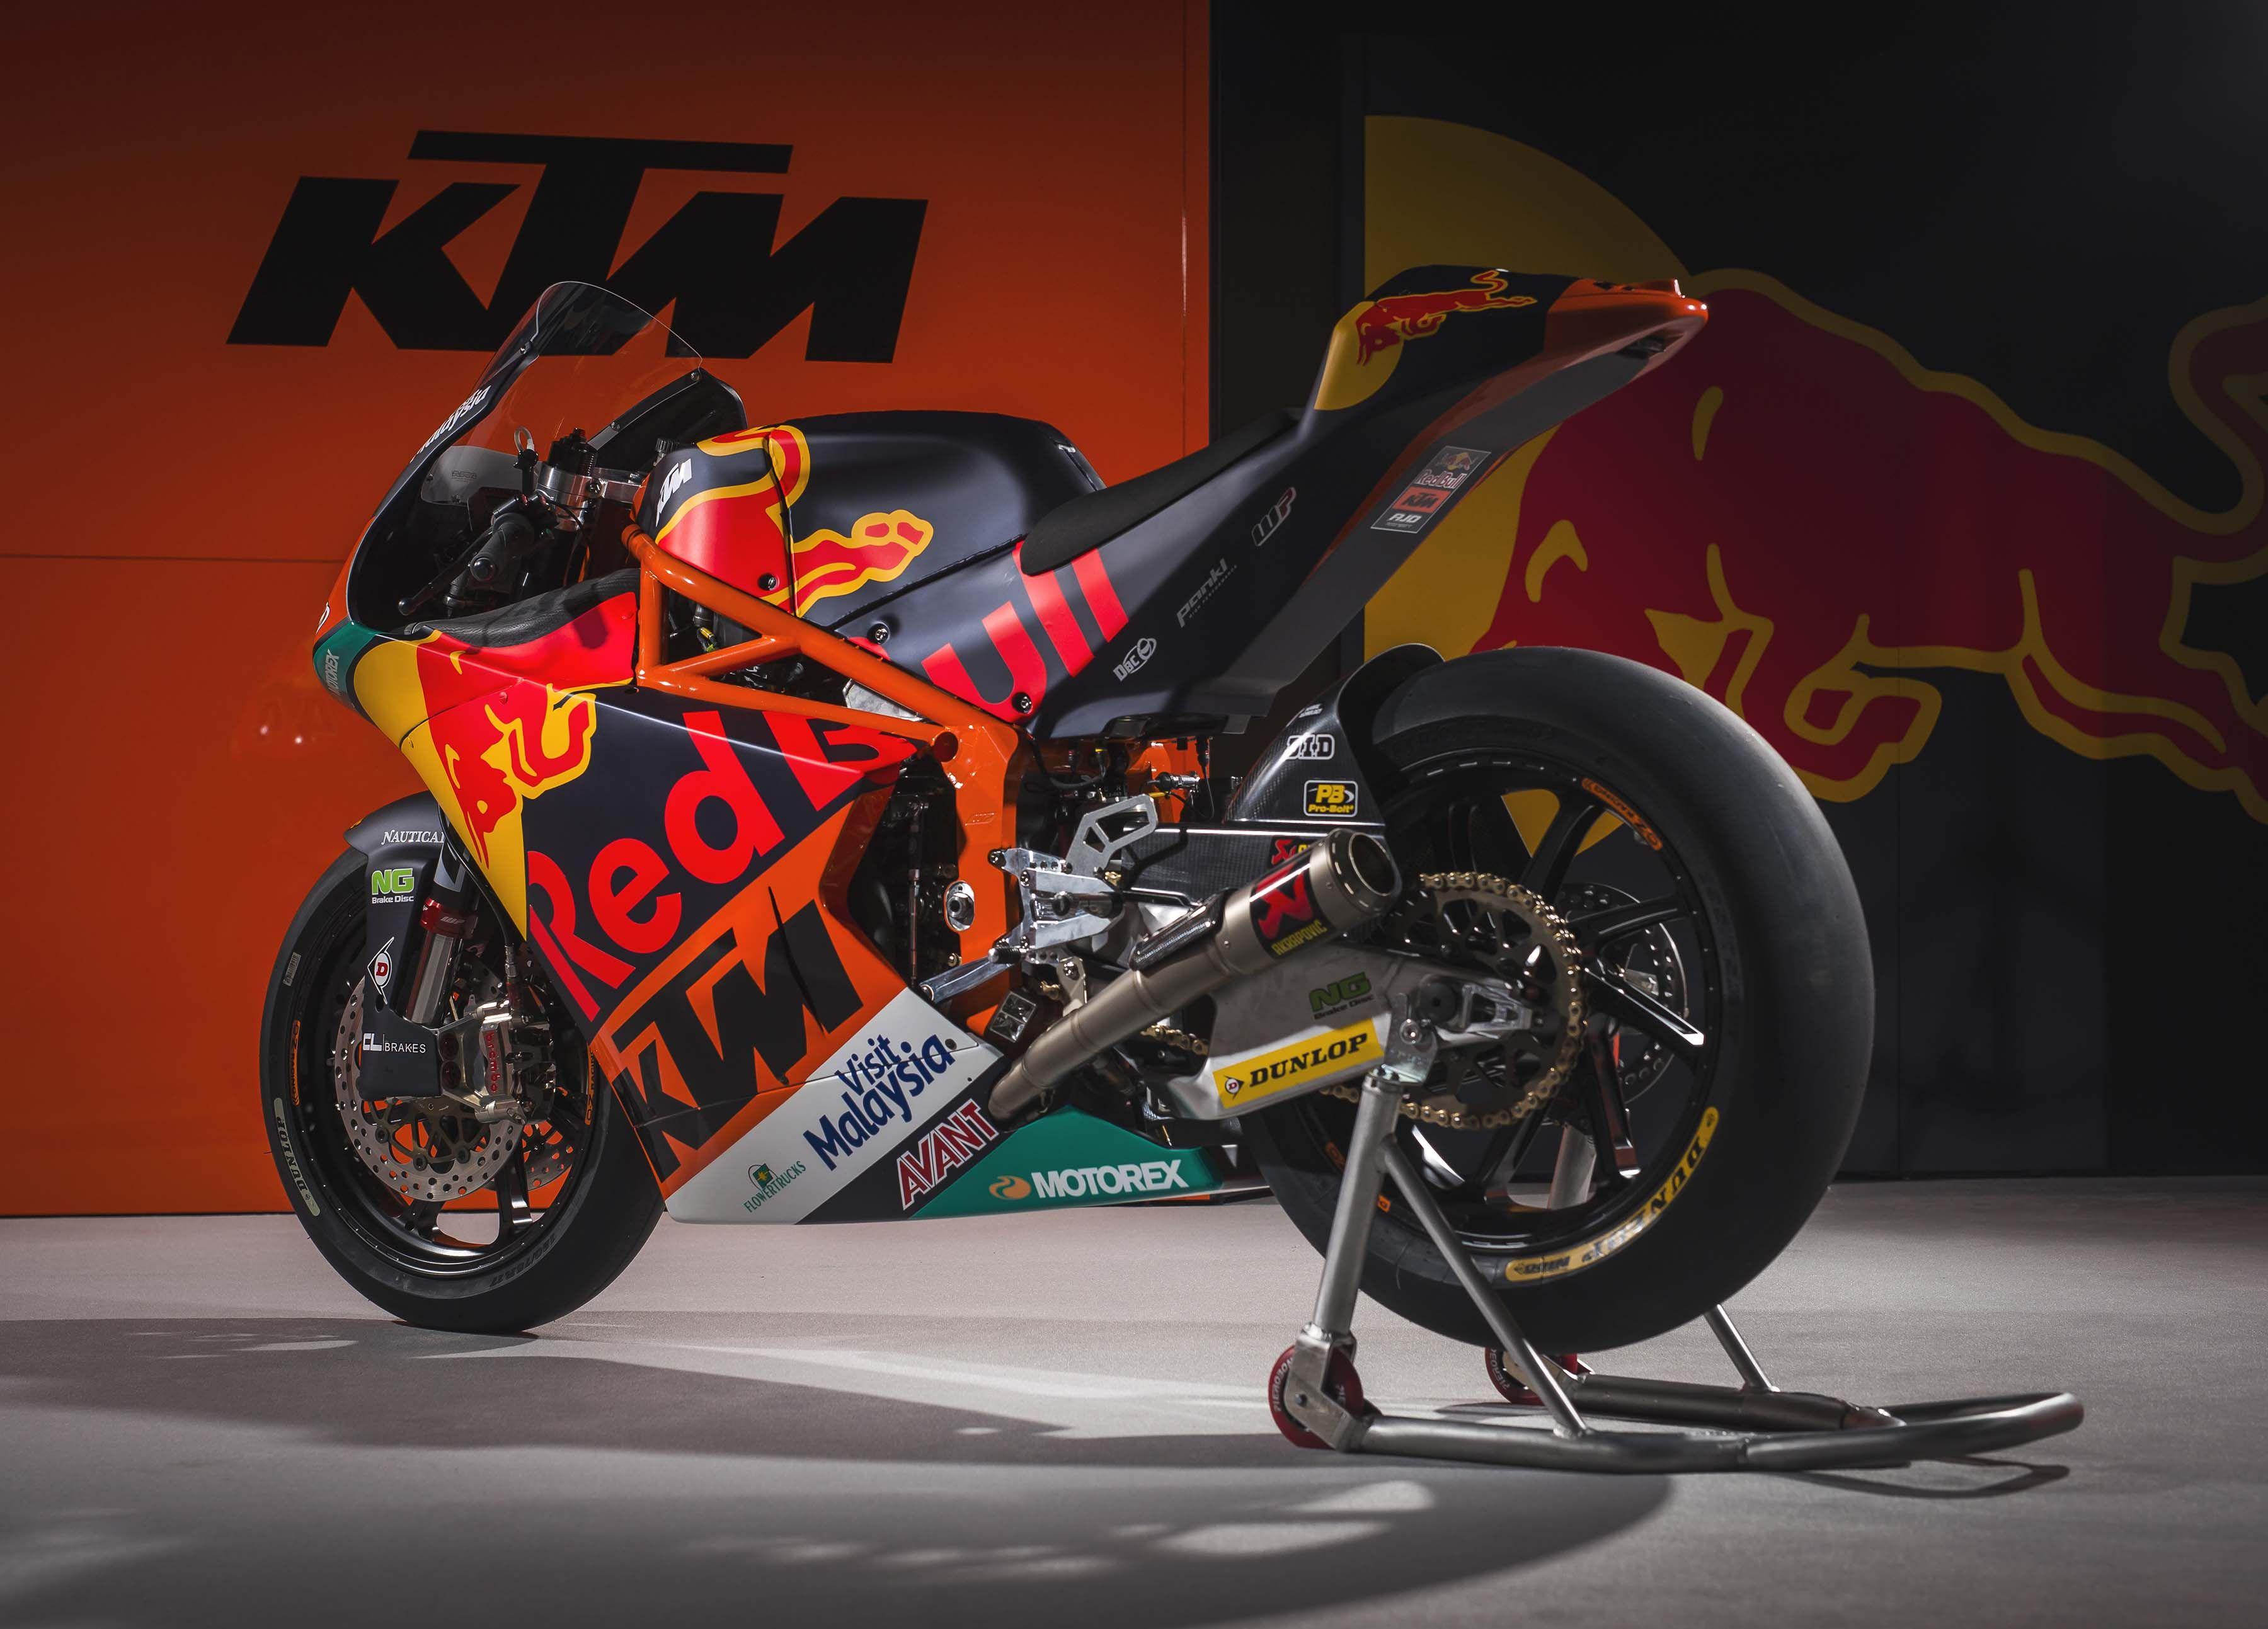 Moody Photos Of The Ktm Moto2 Race Bike Asphalt Rubber Ktm Racing Bikes Sports Bikes Motorcycles